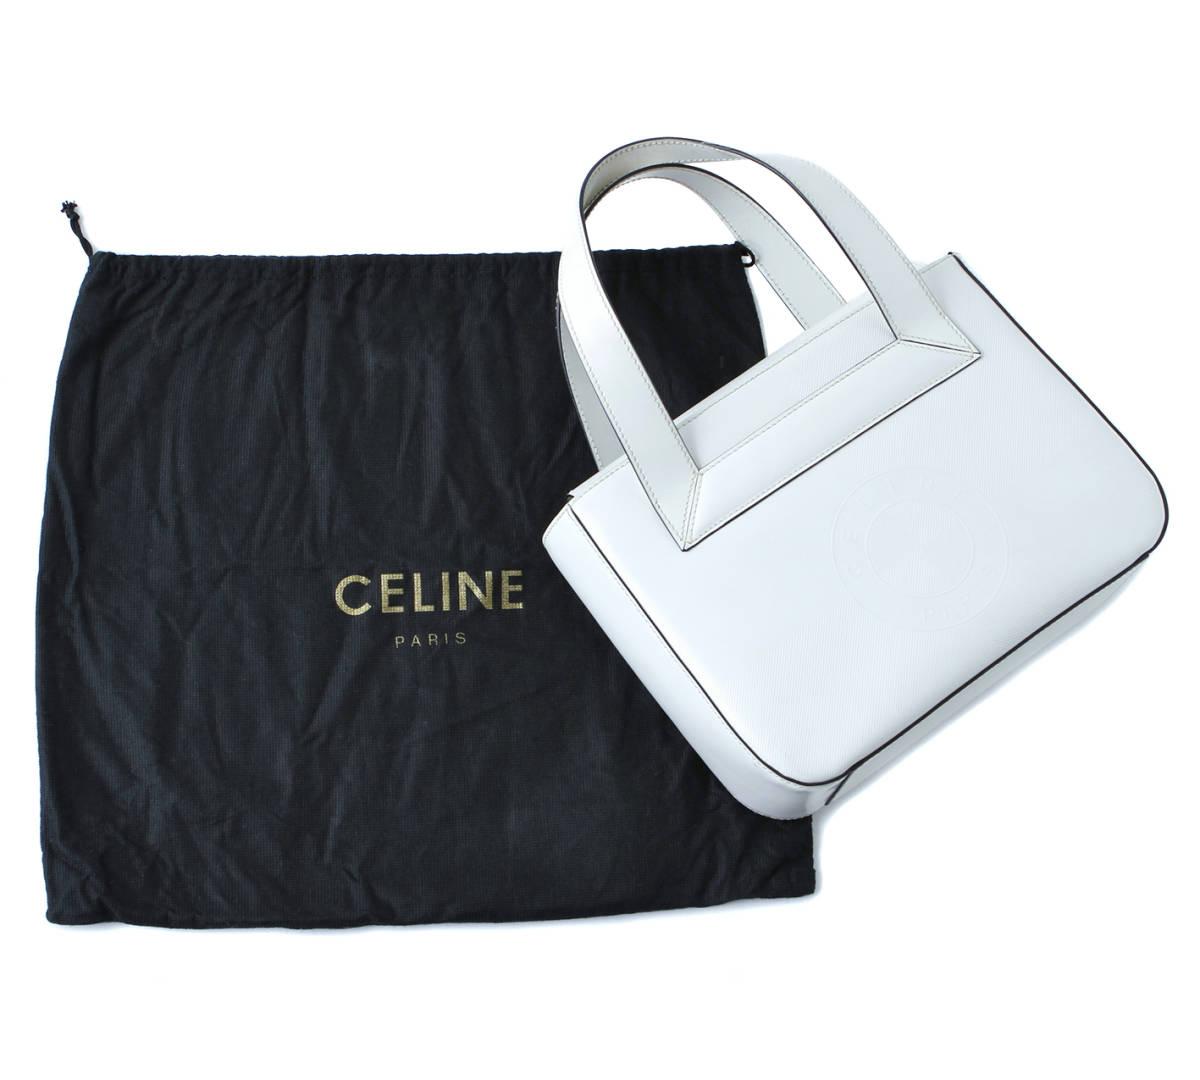 2b9867ea5a86 美品 CELINE セリーヌ サークルロゴ 型押し ハンドバッグ トートバッグ イタリア製 白 ホワイト ヴィンテージ 希少